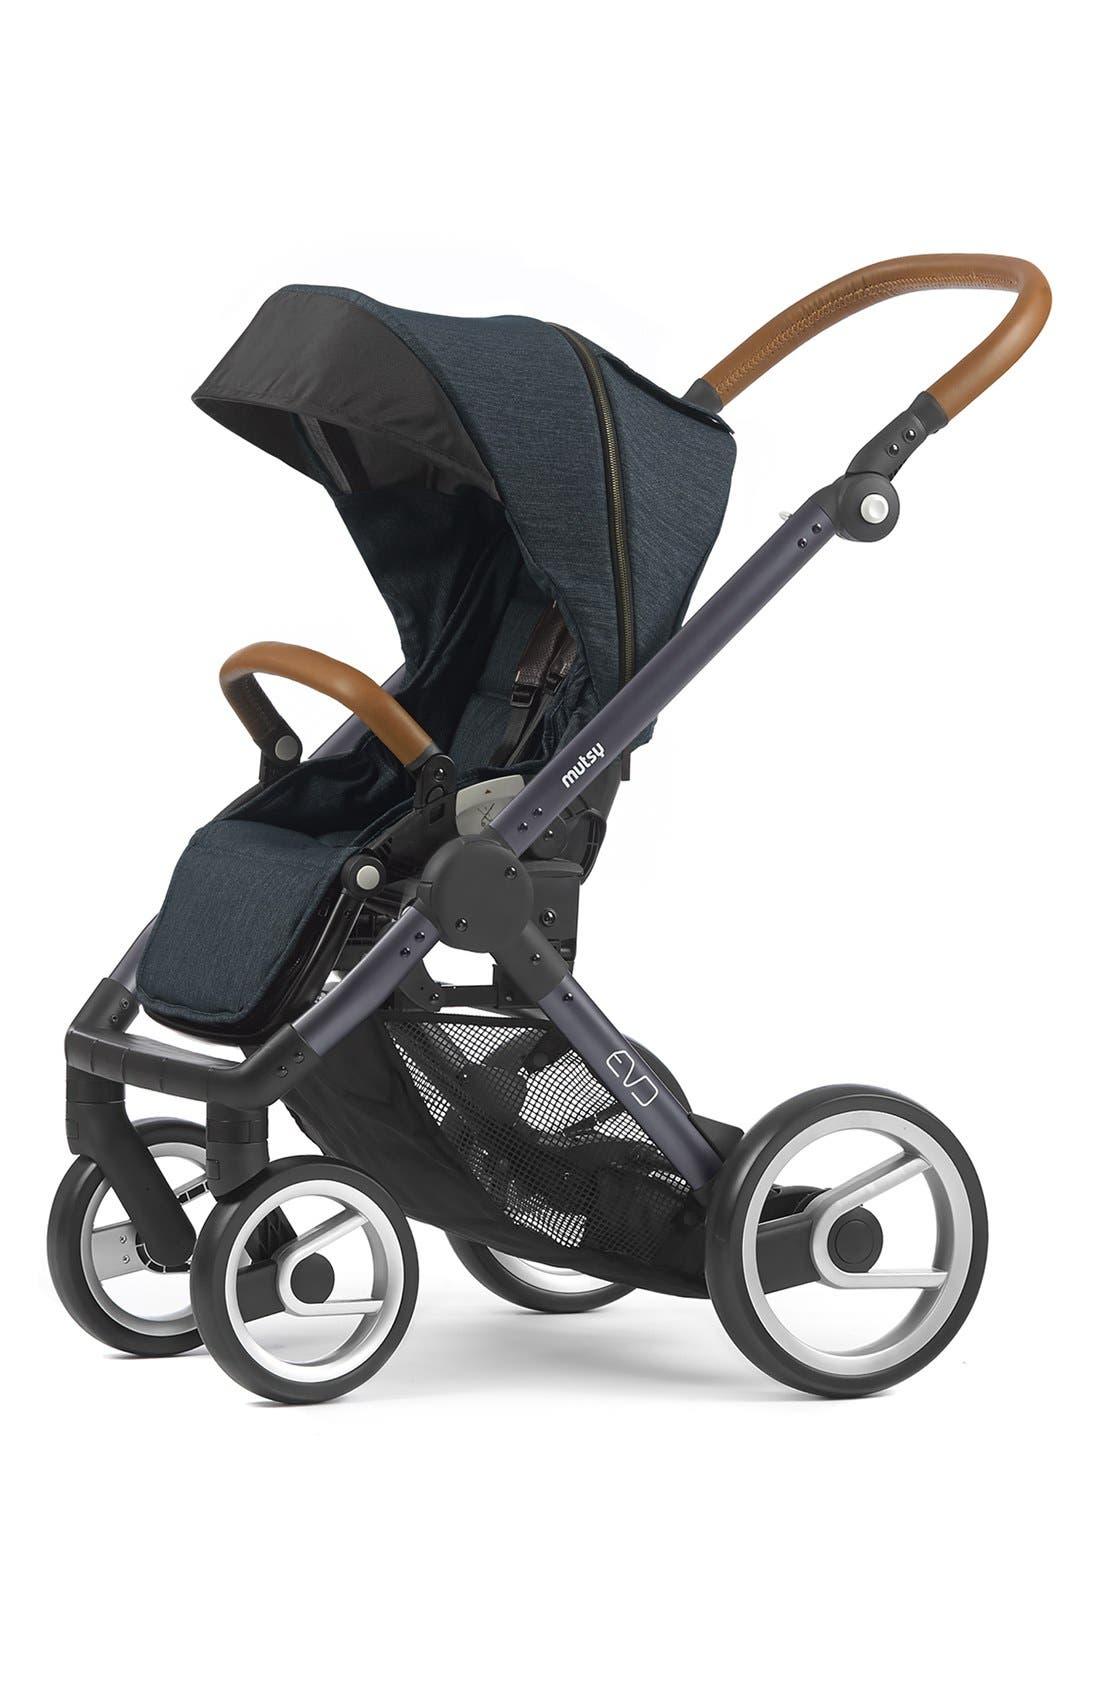 Main Image - Mutsy 'Evo - Industrial' Stroller